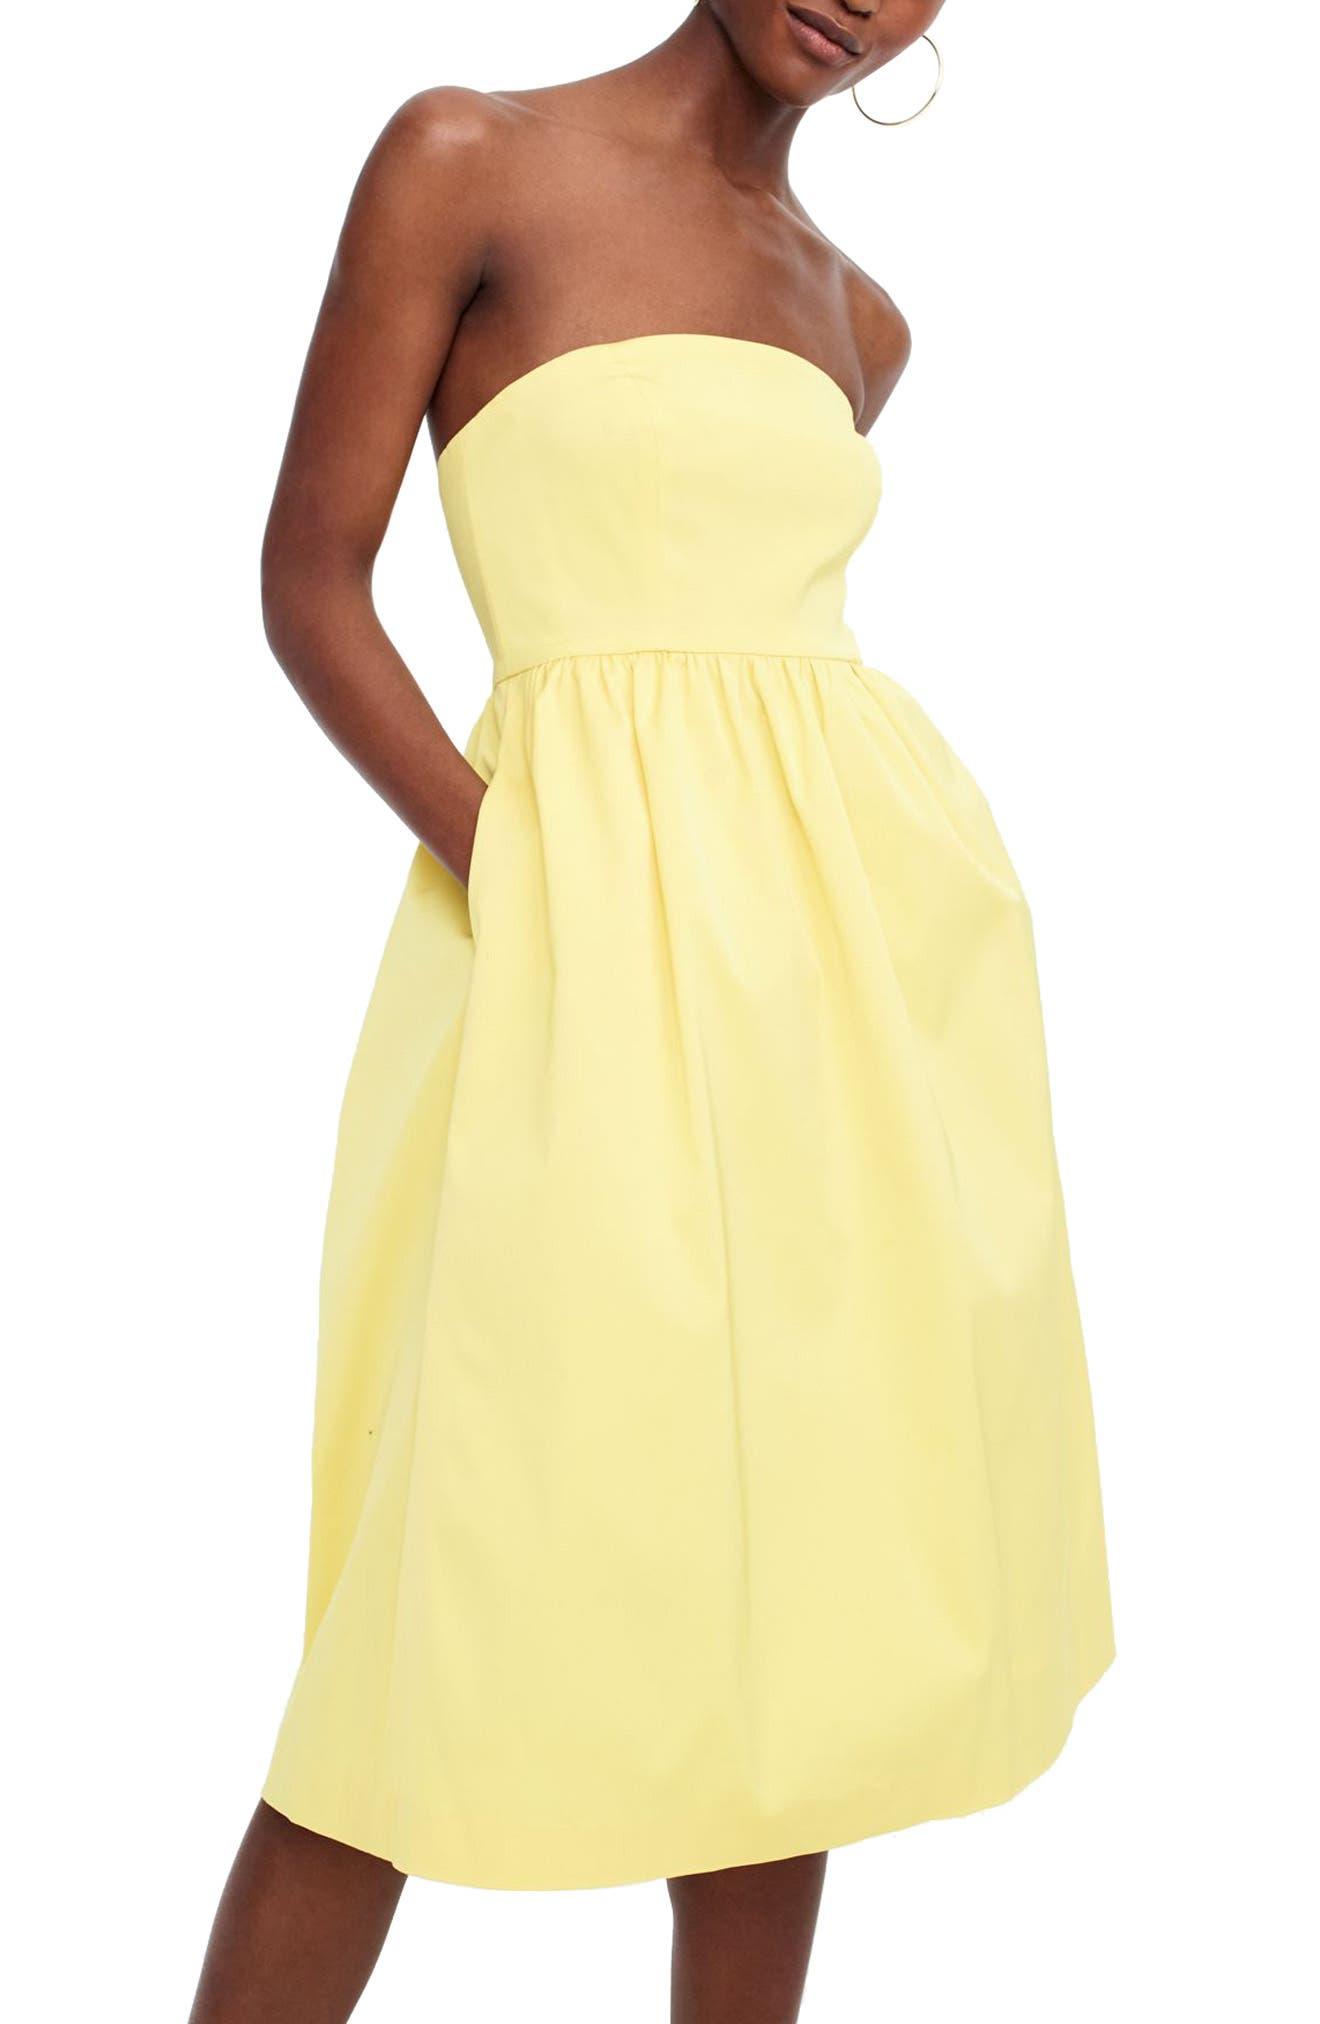 J.Crew Strapless Fit & Flare Dress,                             Main thumbnail 1, color,                             Bright Lemon